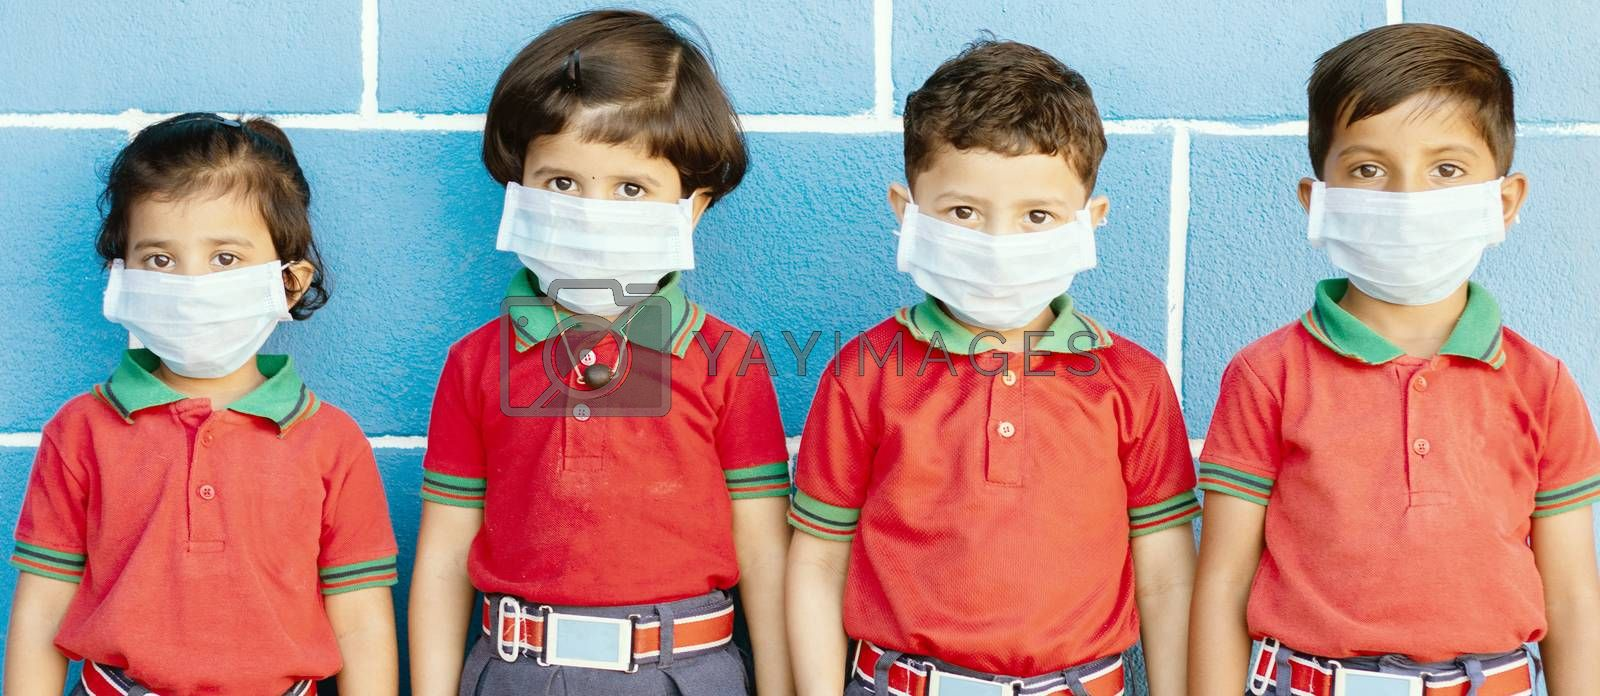 School preteen kids with protection face mask against new coronavirus, covid -19, nCov 2019 or sars cov 2 virus at school - children wore medical mask due to coronavirus outbreak. by lakshmiprasad.maski@gmai.com